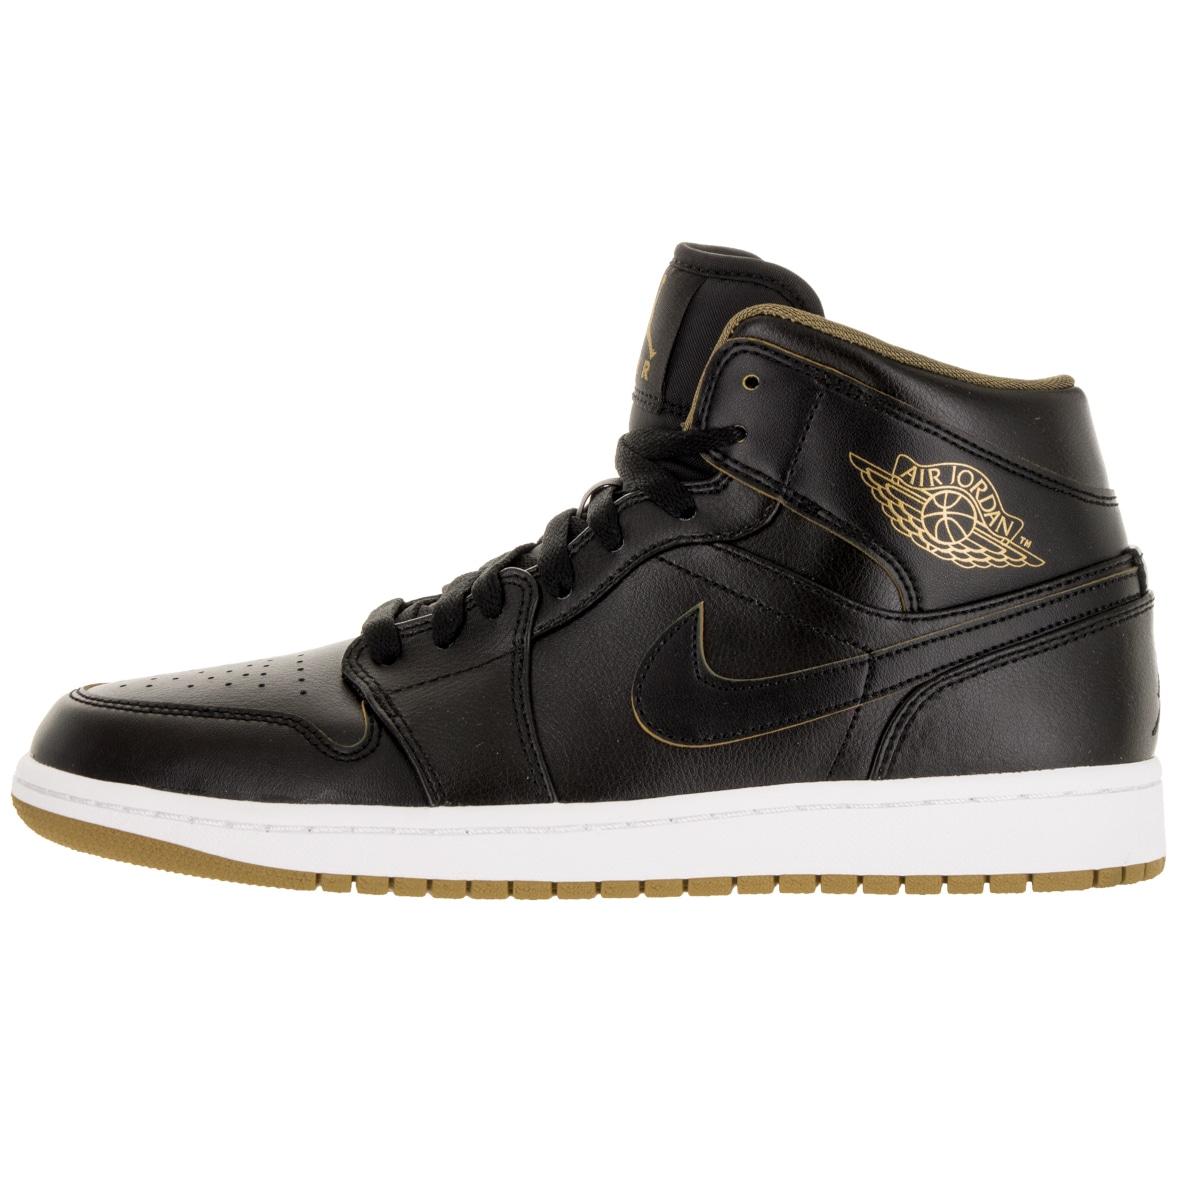 776a3d802e3 Shop Nike Jordan Men s Air Jordan 1 Mid Black Metallic Gold White  Basketball Shoe - Free Shipping Today - Overstock - 12318721